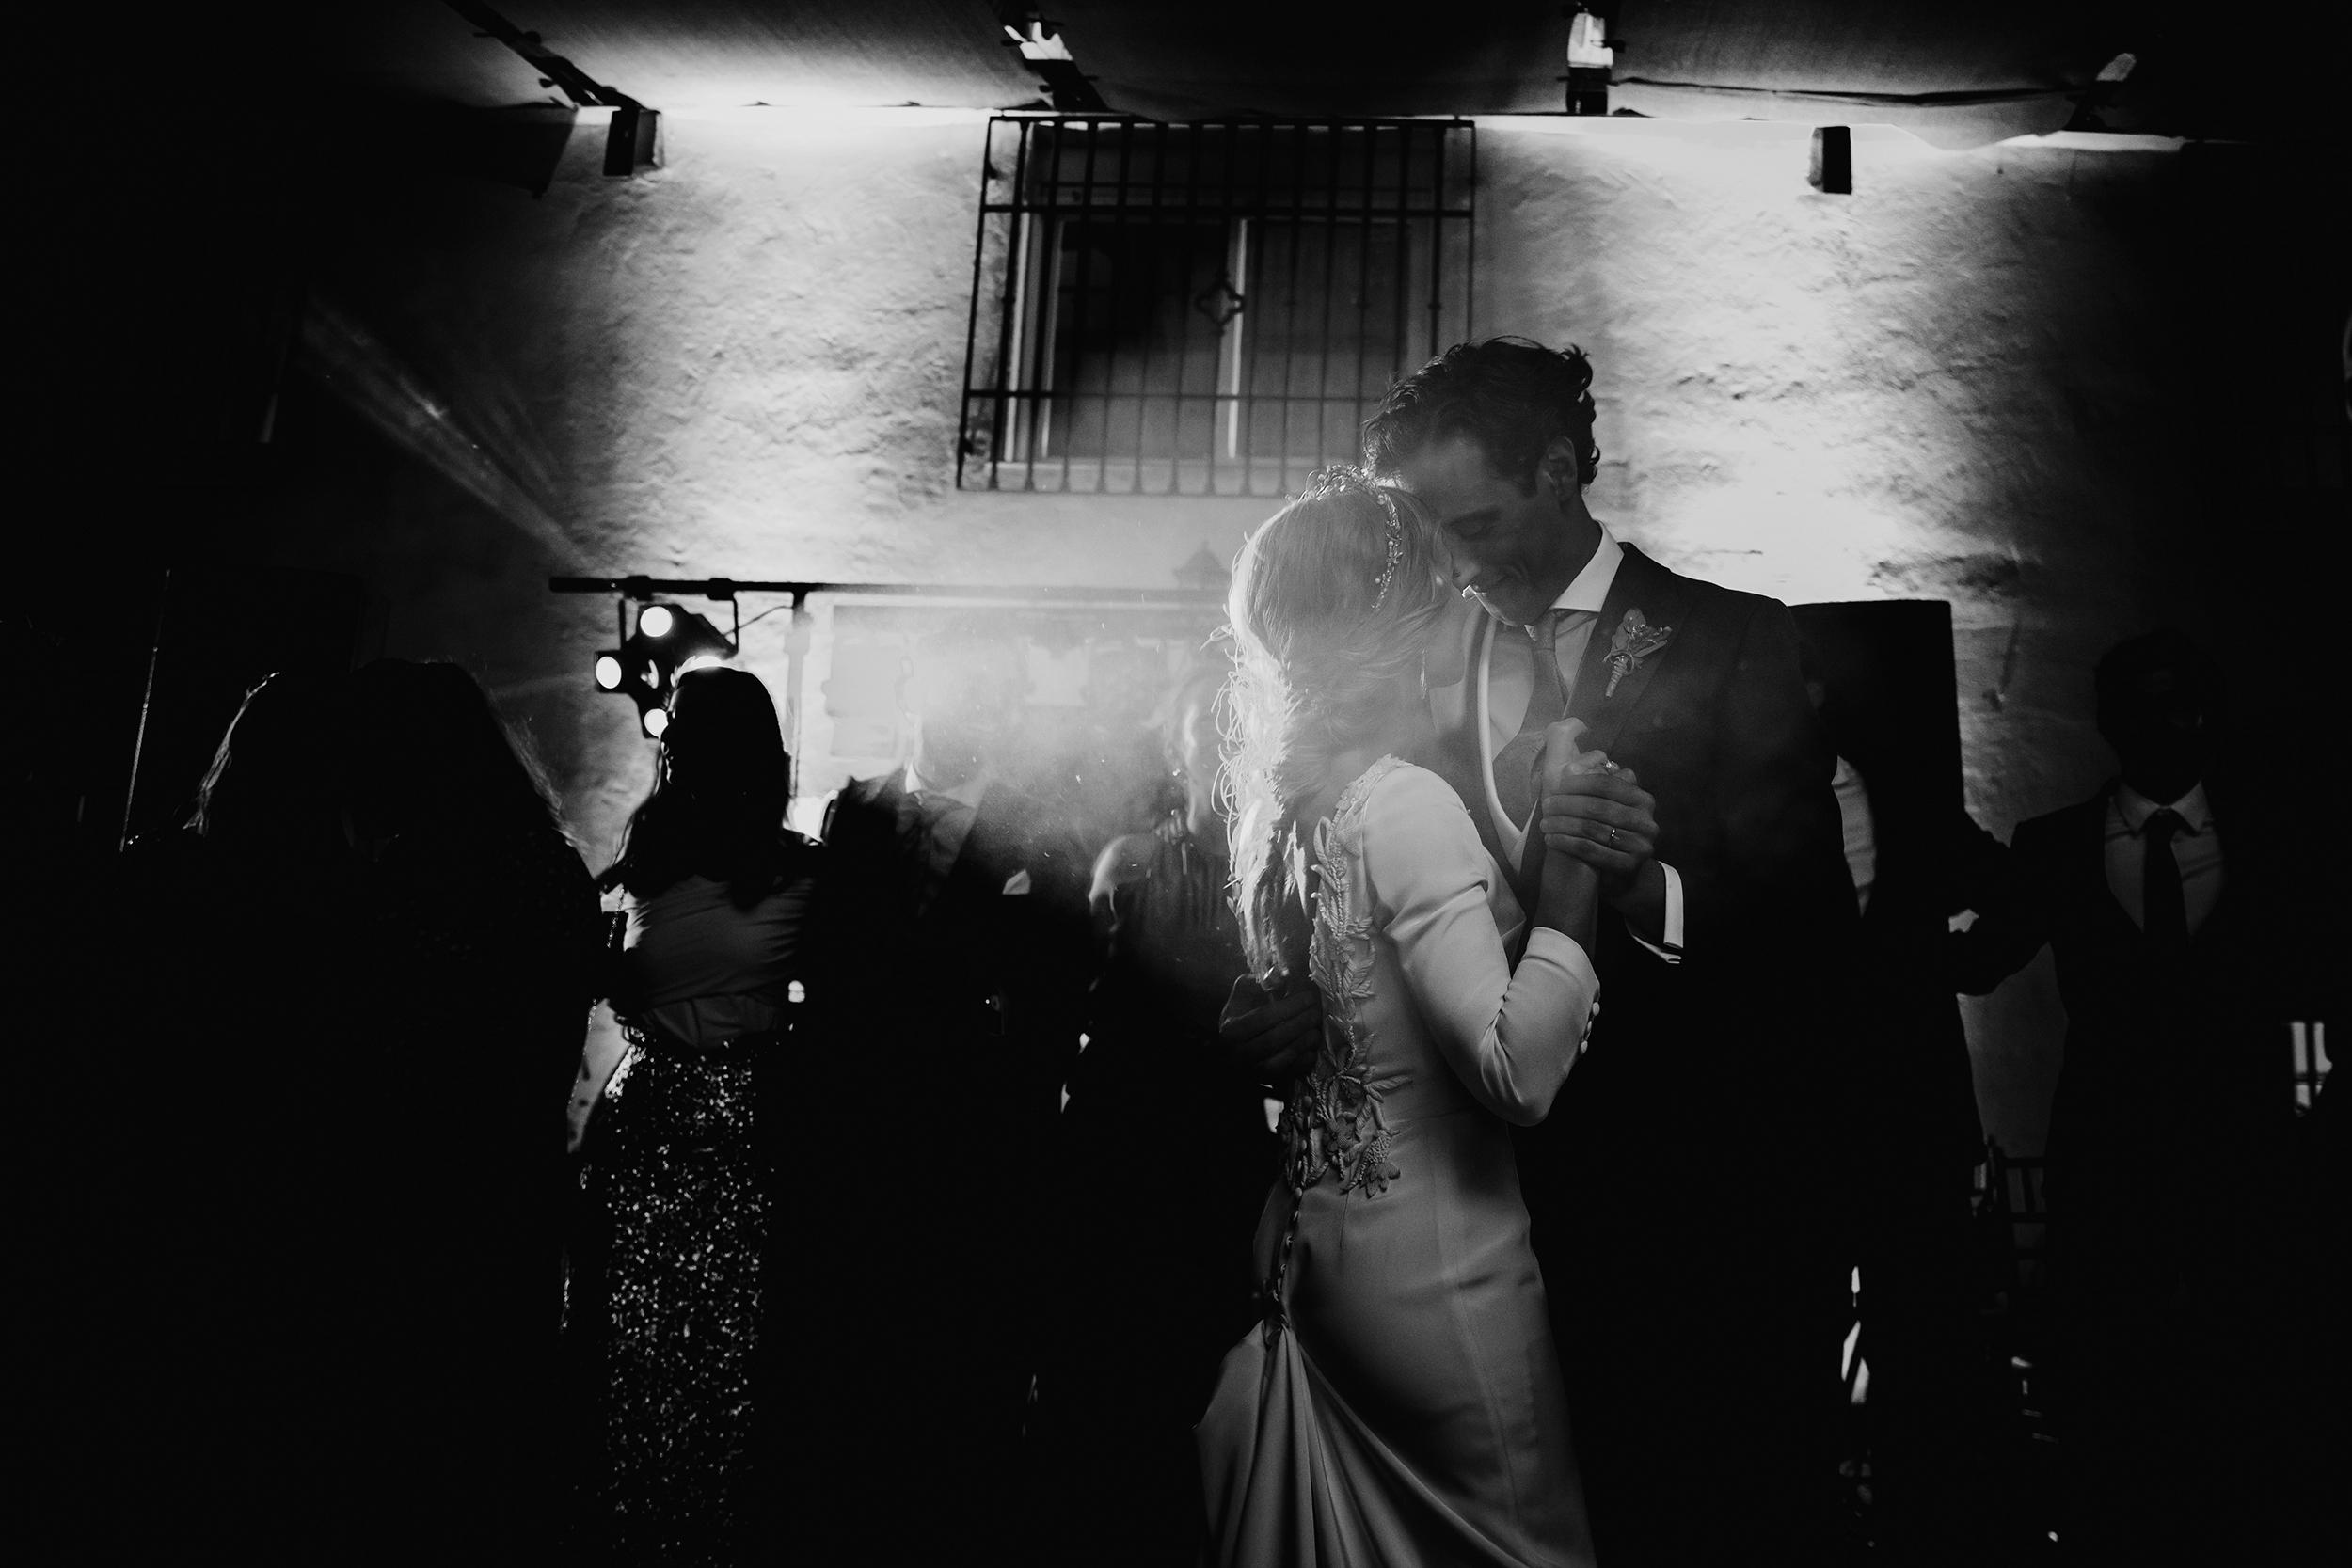 fotografo-bodas-granada-catedral-sagrario-jose-reyes_084.jpg